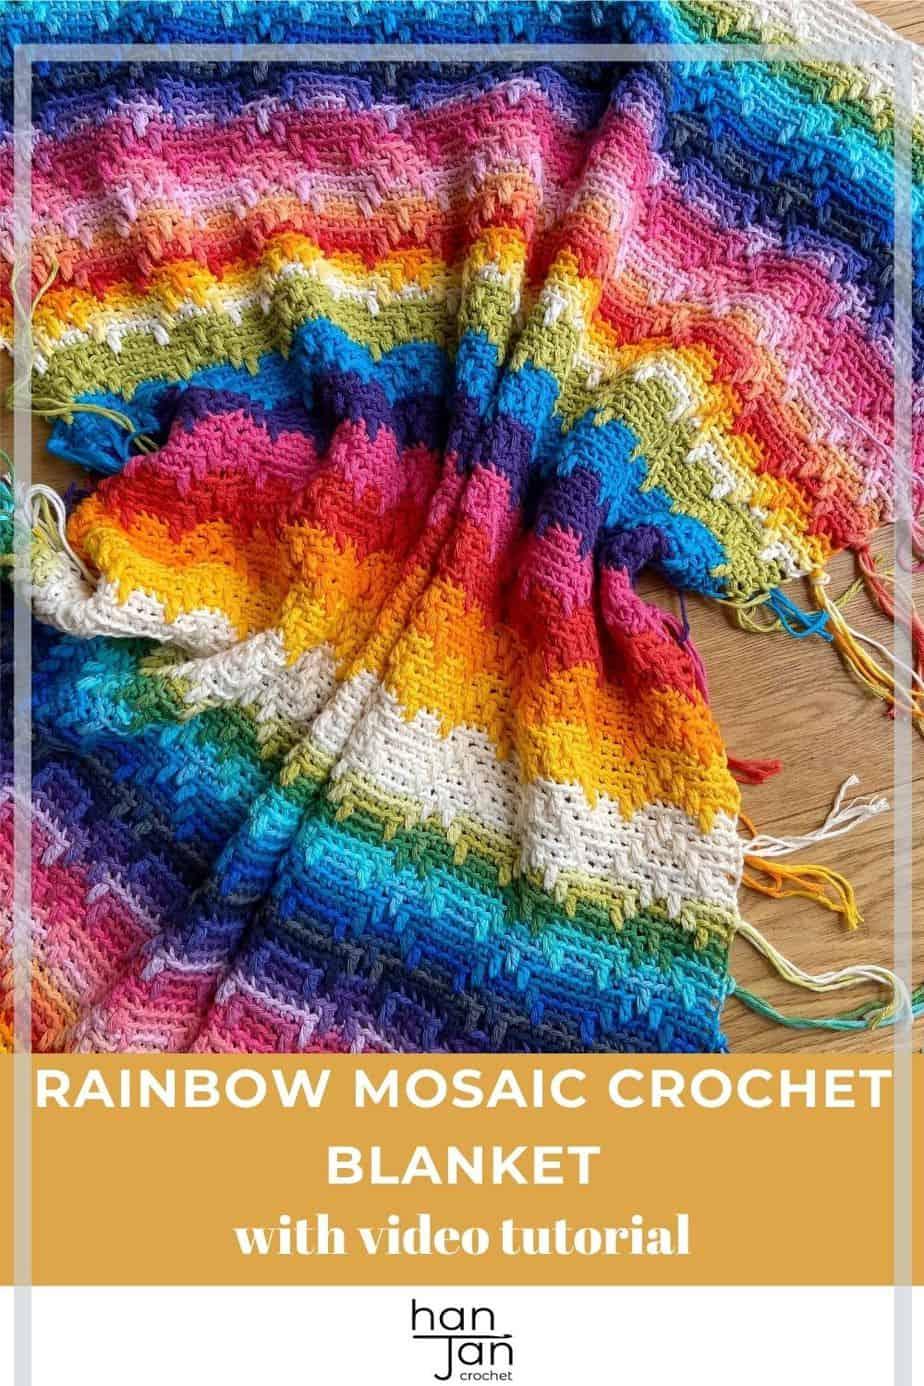 rainbow crochet blanket using overlay mosaic crochet technique with tassels laid on wooden floor